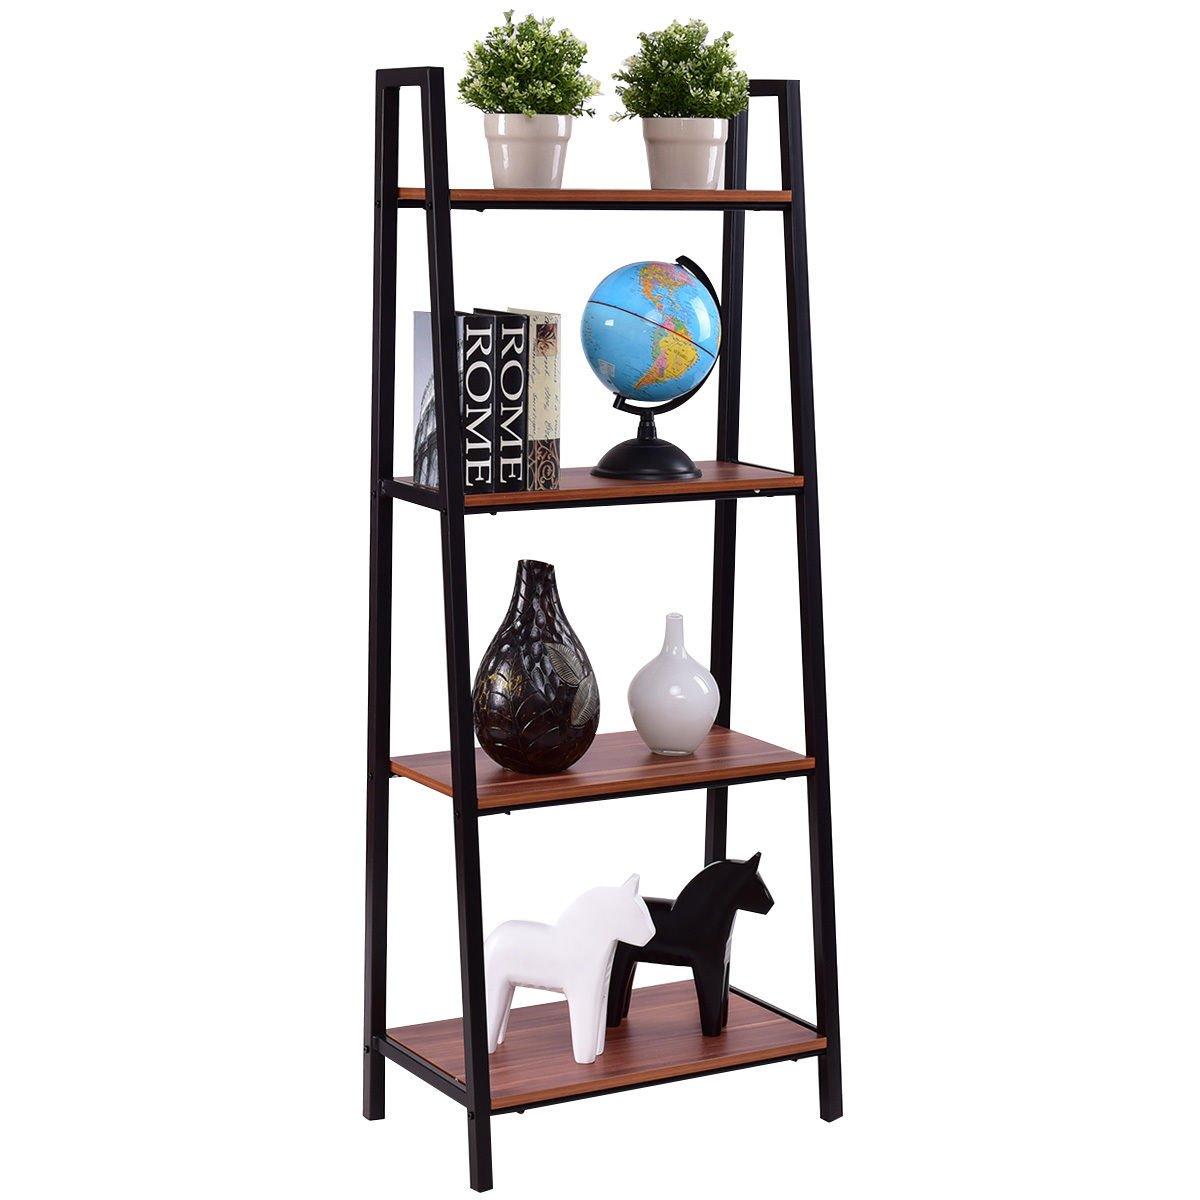 TANGKULA 4-Tier Ladder Shelf Ladder Bookcase Bookshelf Display Shelves (1) AM1086HM